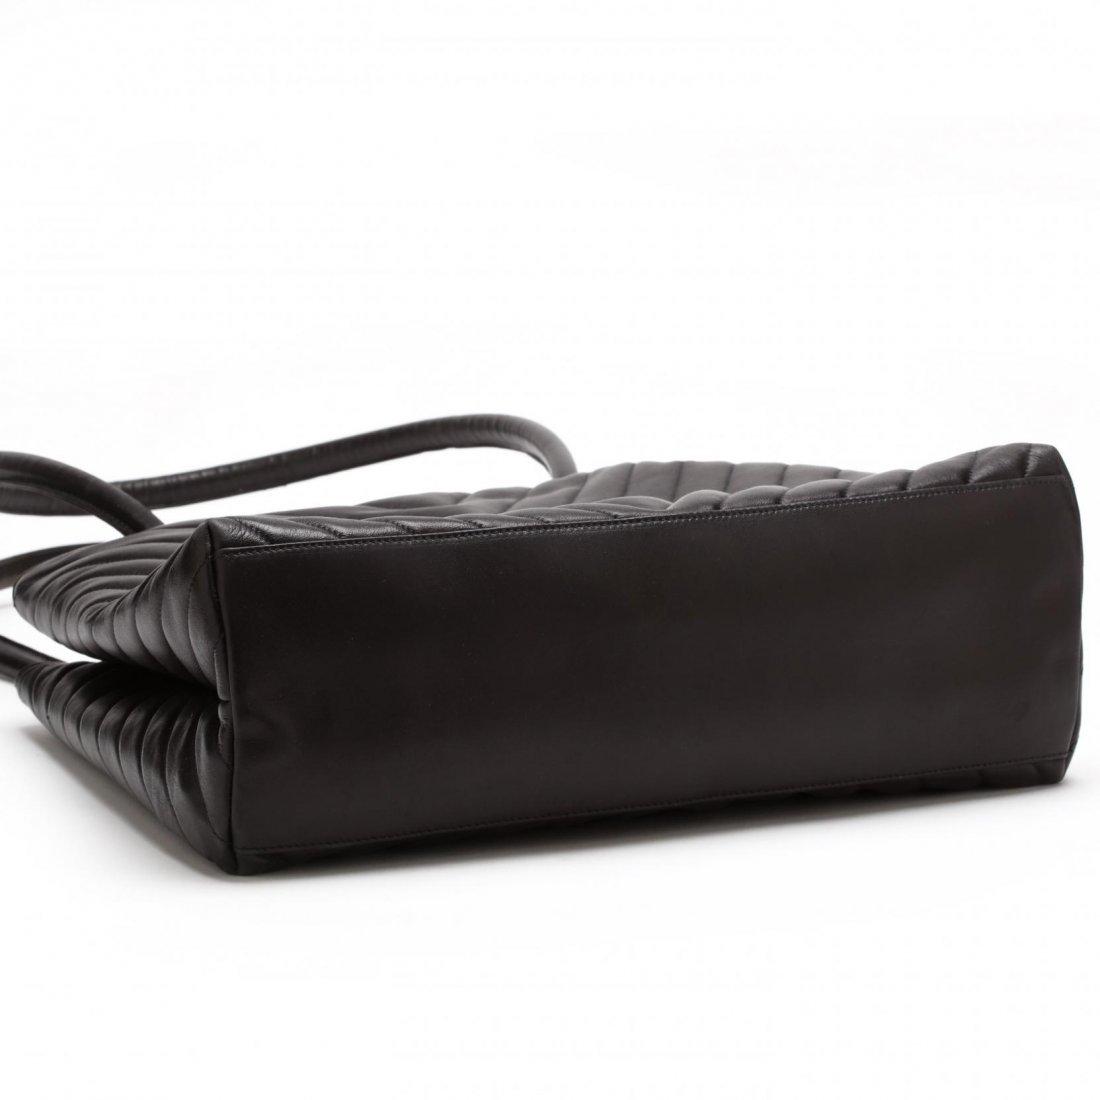 Vintage Lambskin Chevron Handbag, Chanel - 3